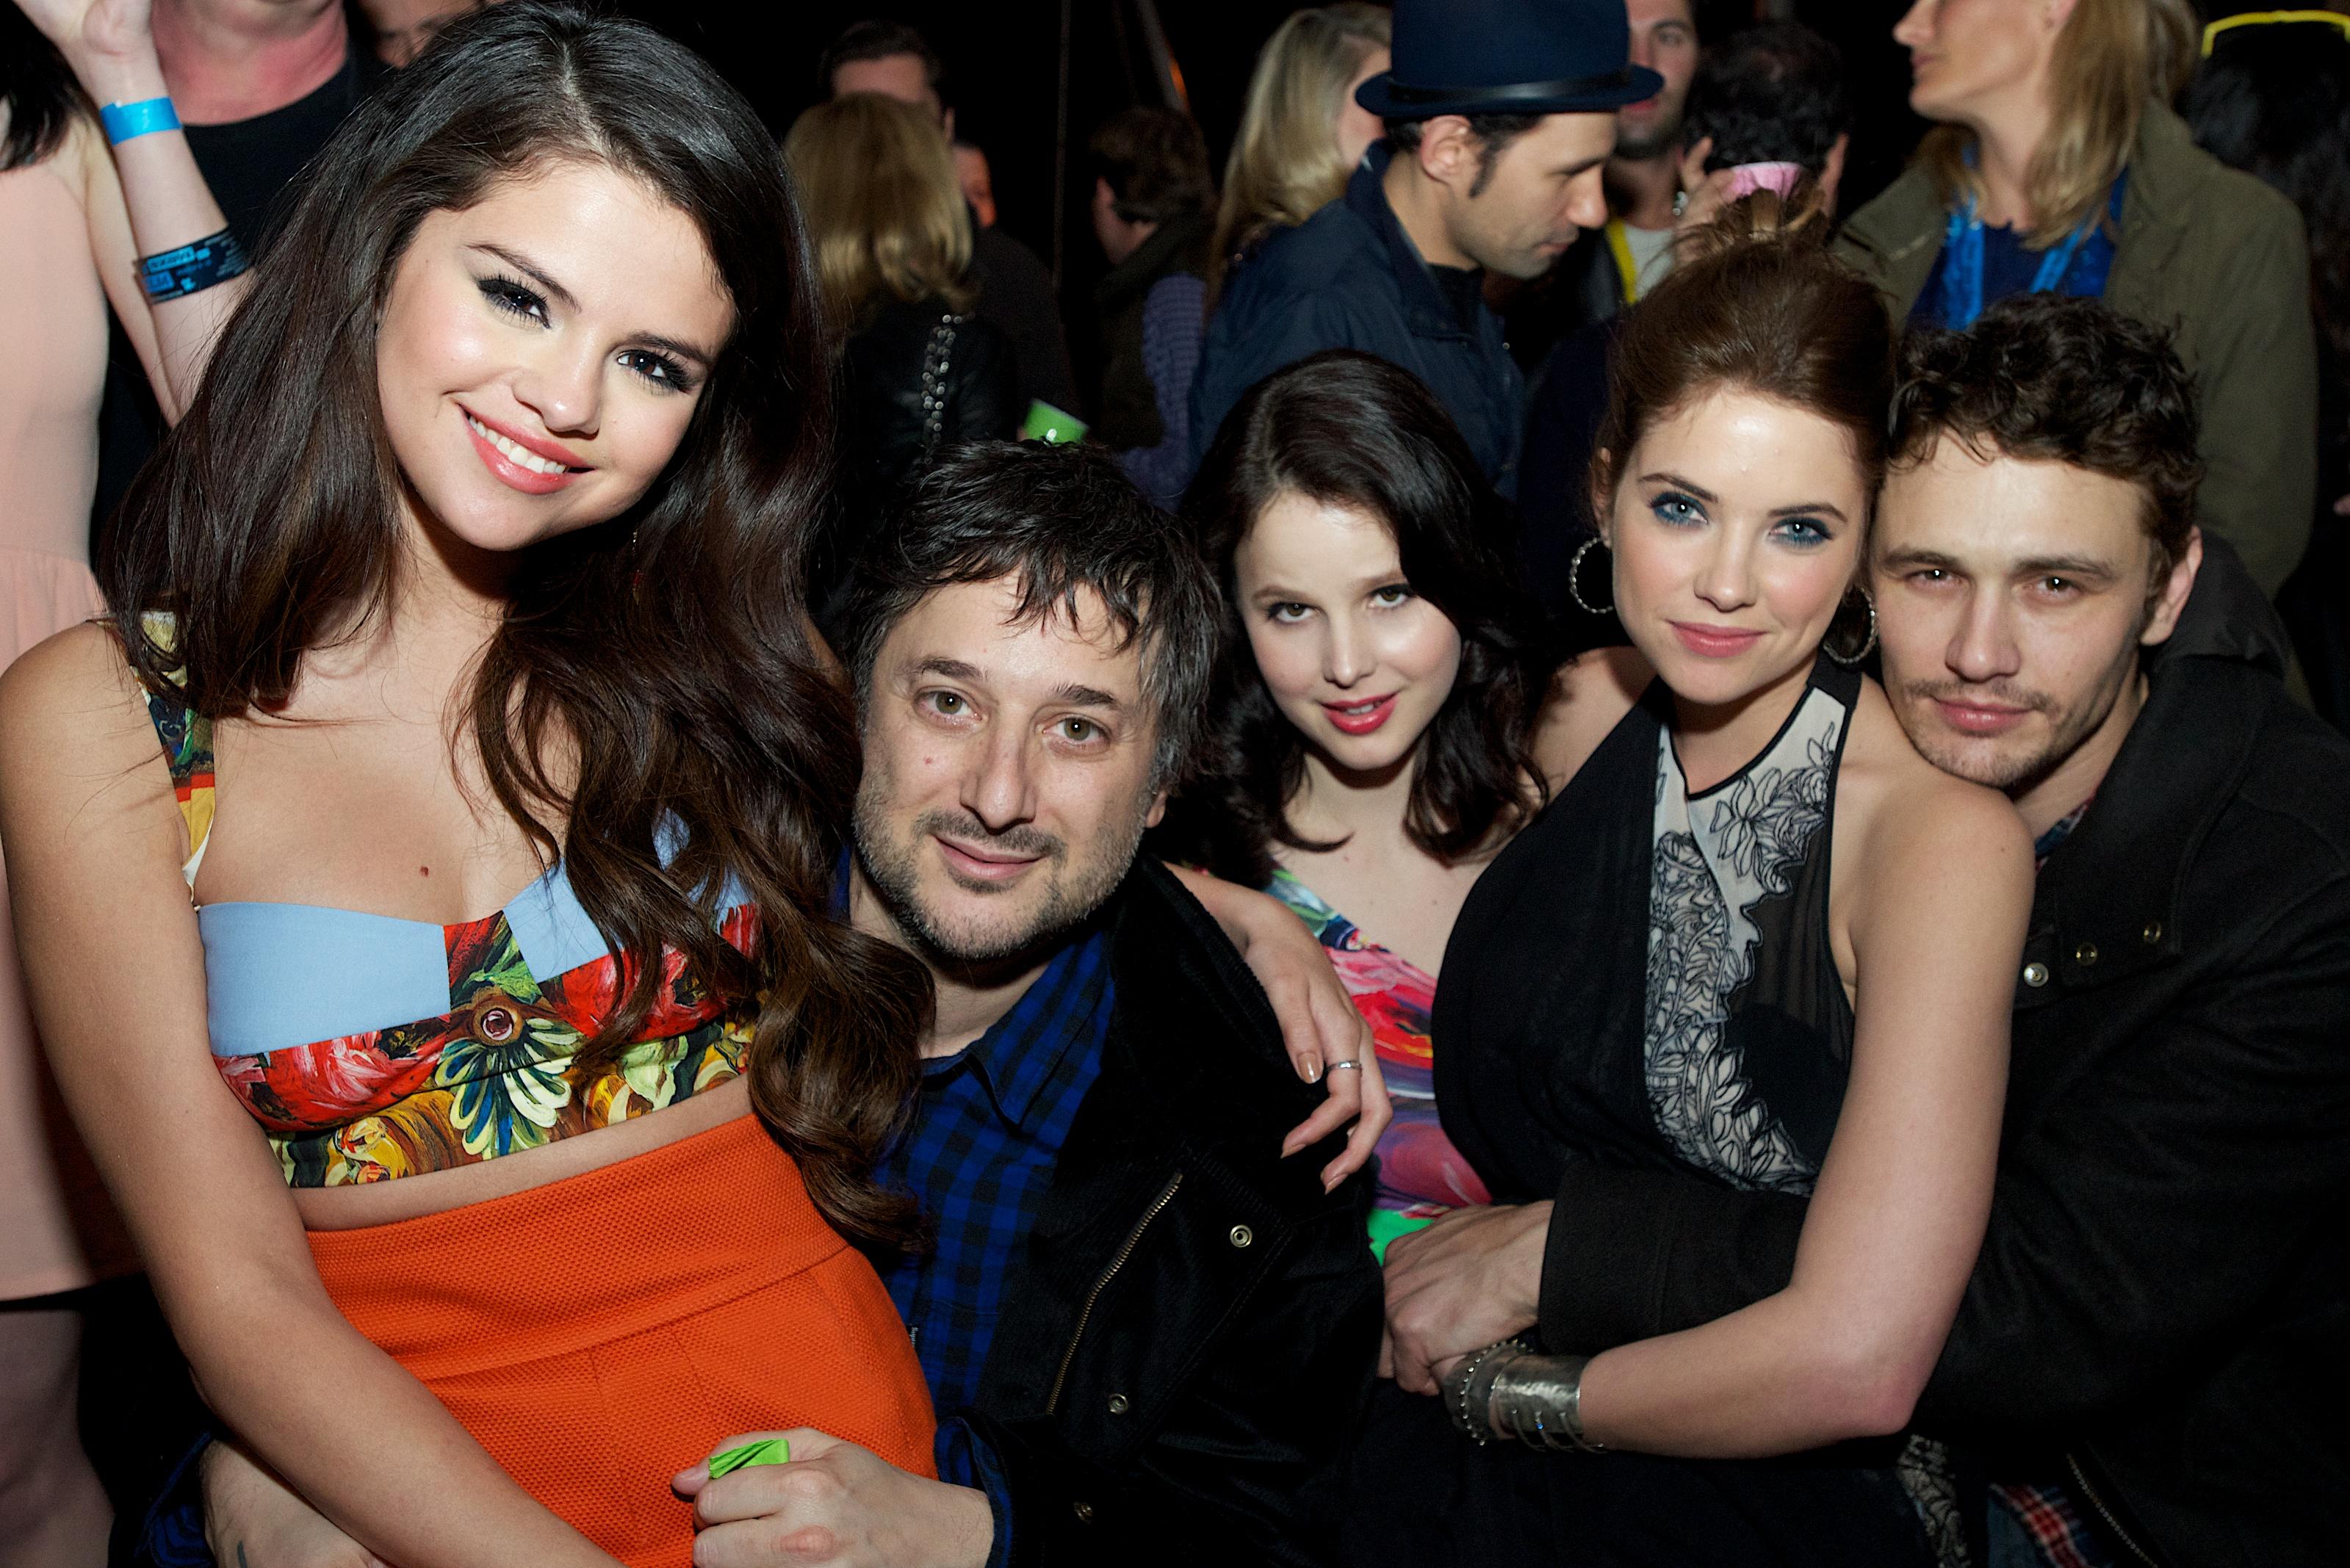 Selena Gomez, Harmony Korine, Rachel Korine, Ashley Benson, and James Franco celebrated at the Spring Breakers afterparty at SXSW.